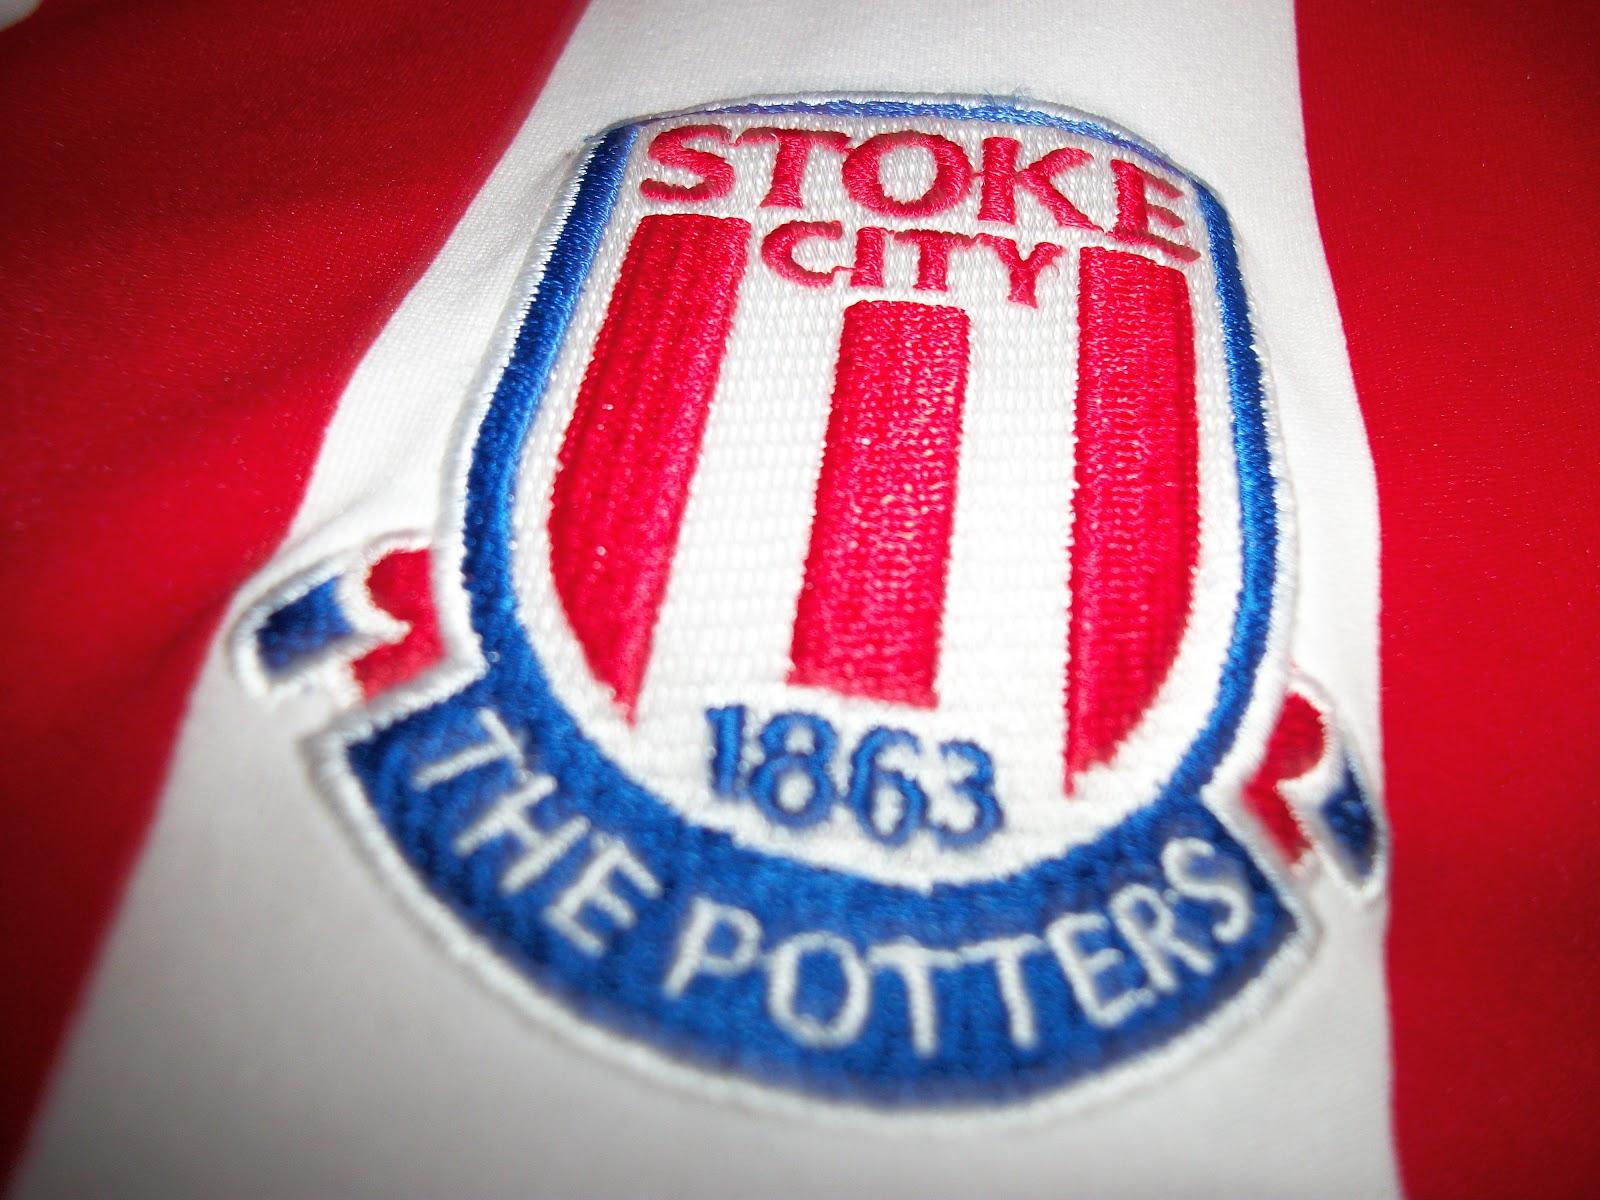 England Football Logos: Stoke City FC Logo Pictures